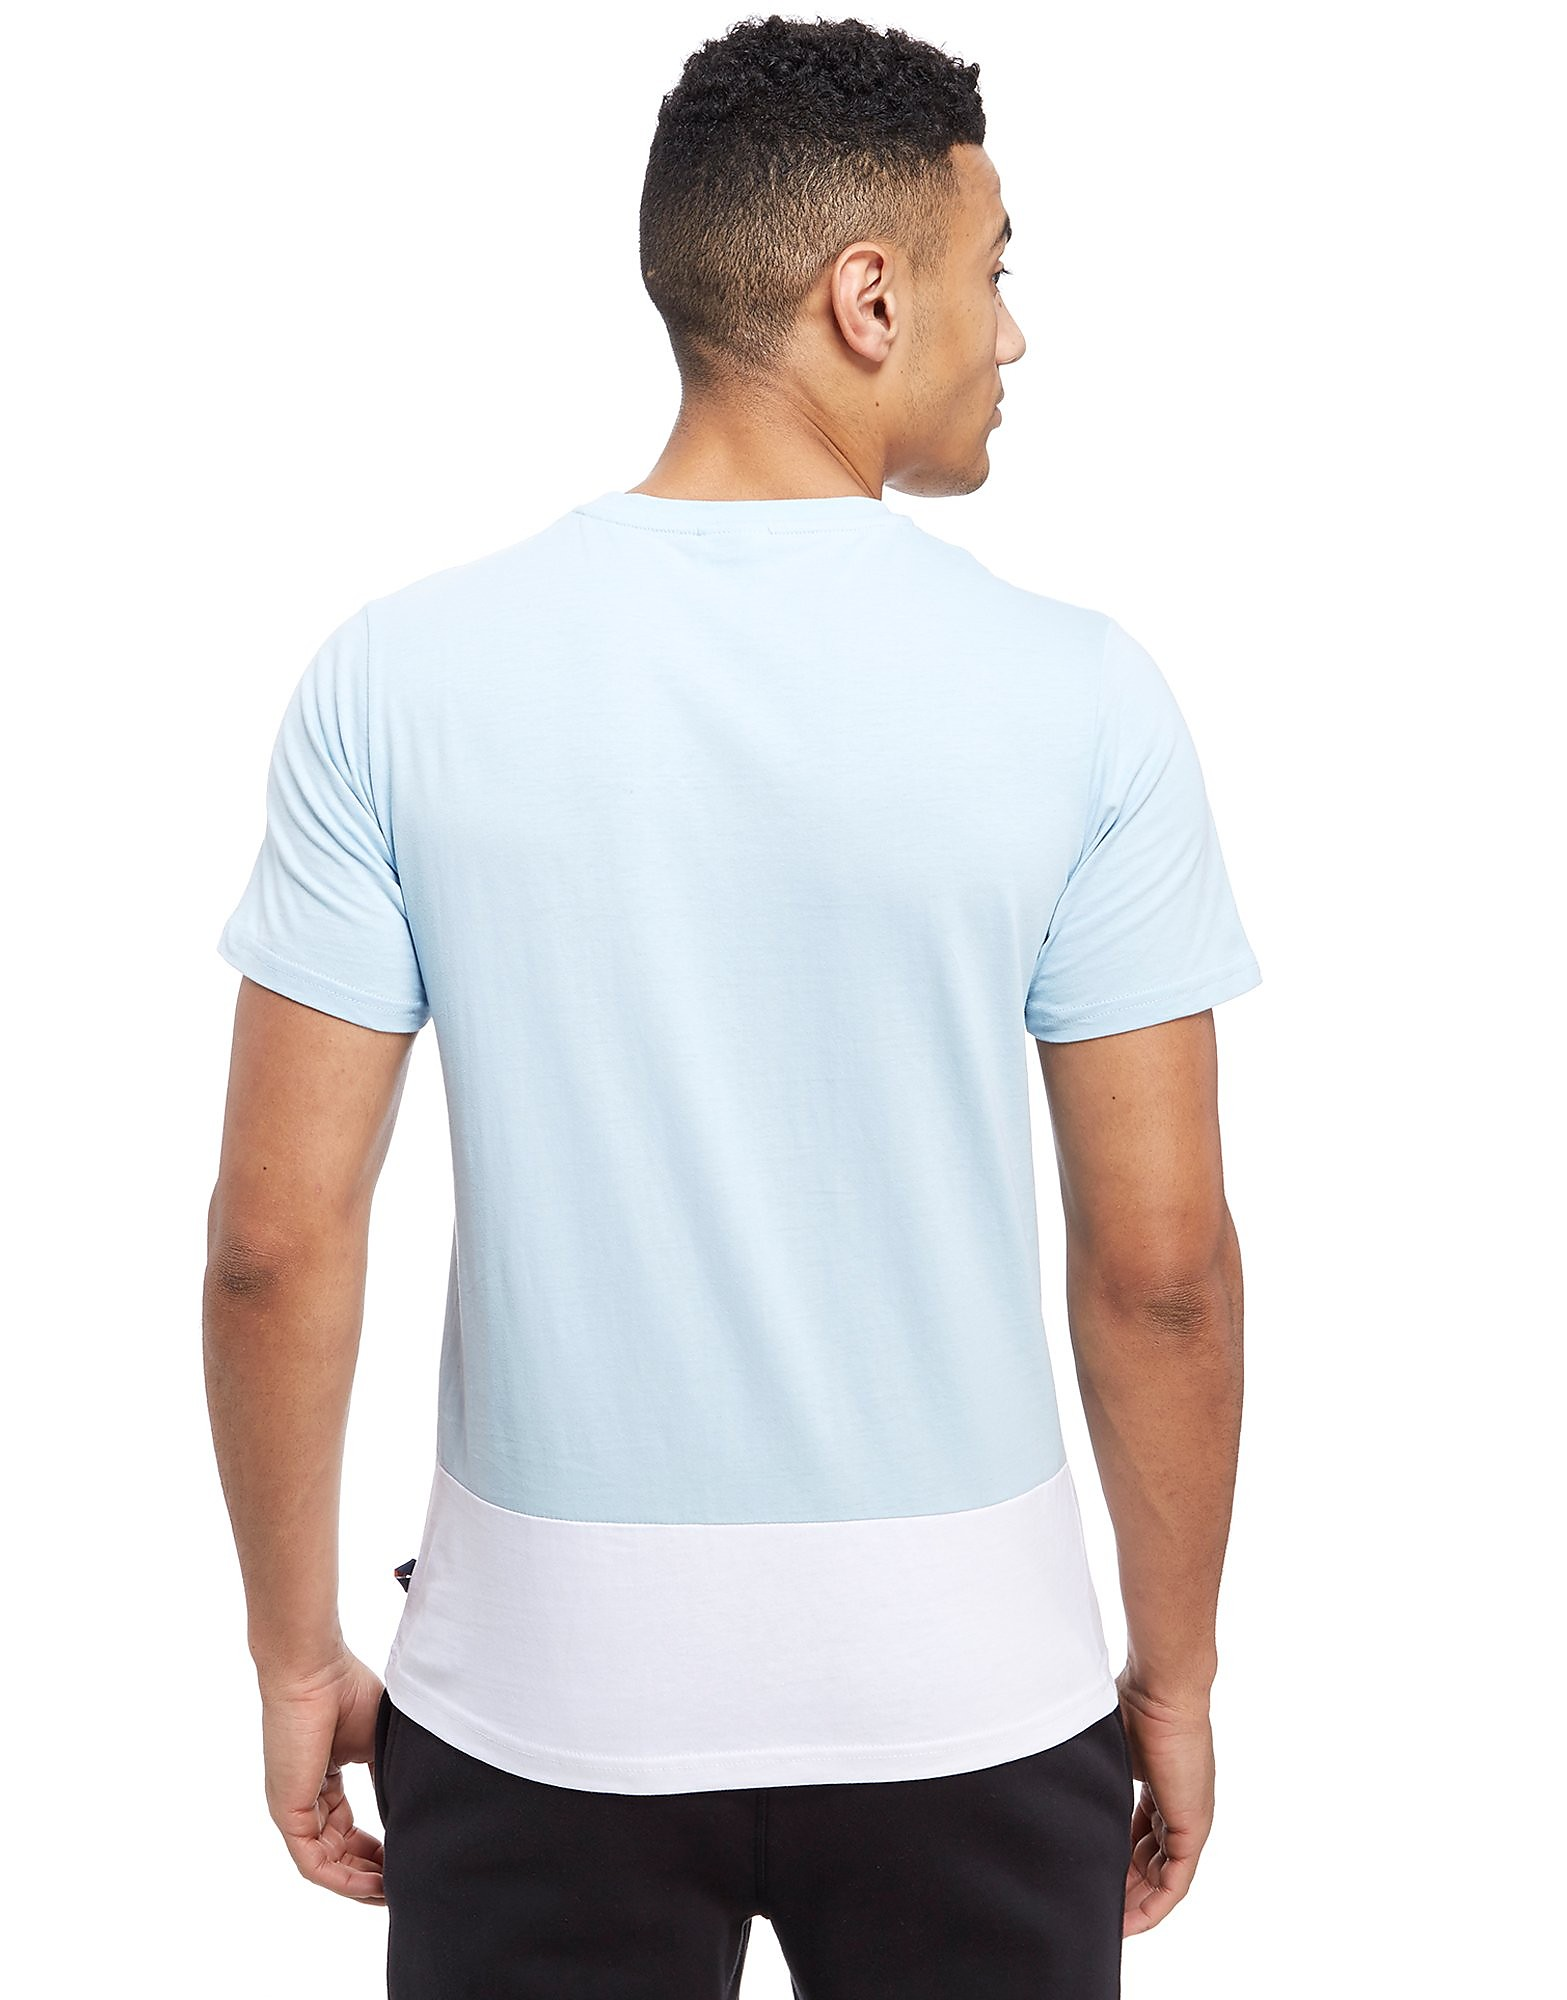 Ellesse Meriano Panel T-Shirt